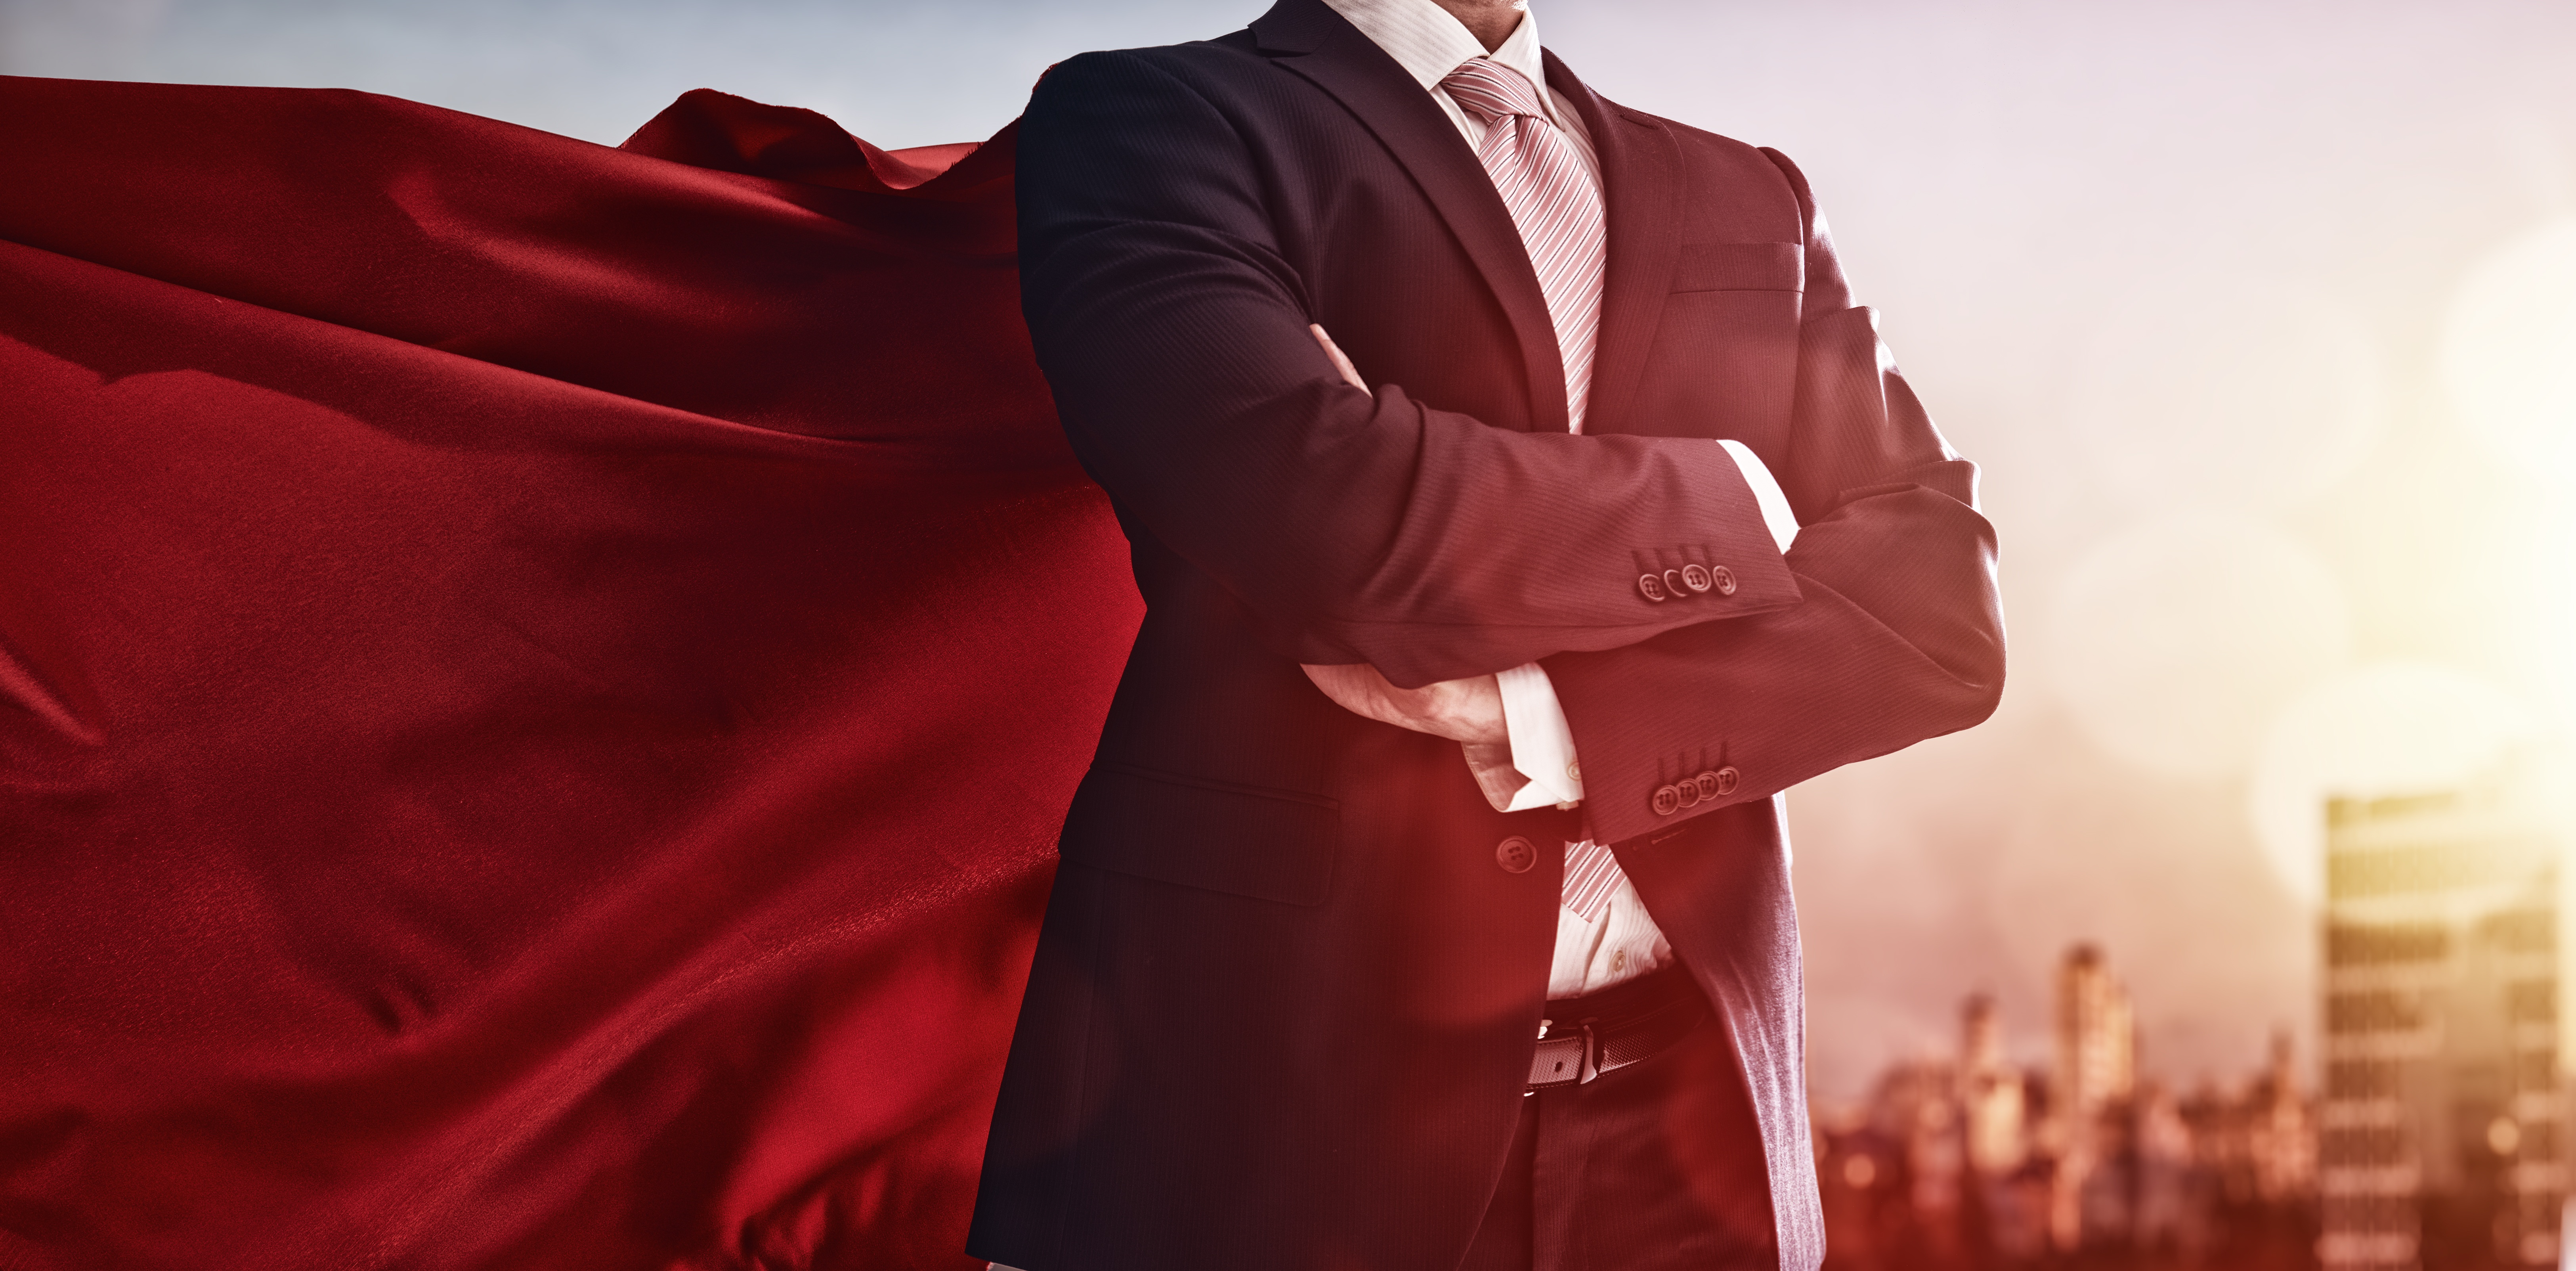 superhero AdobeStock_101916360